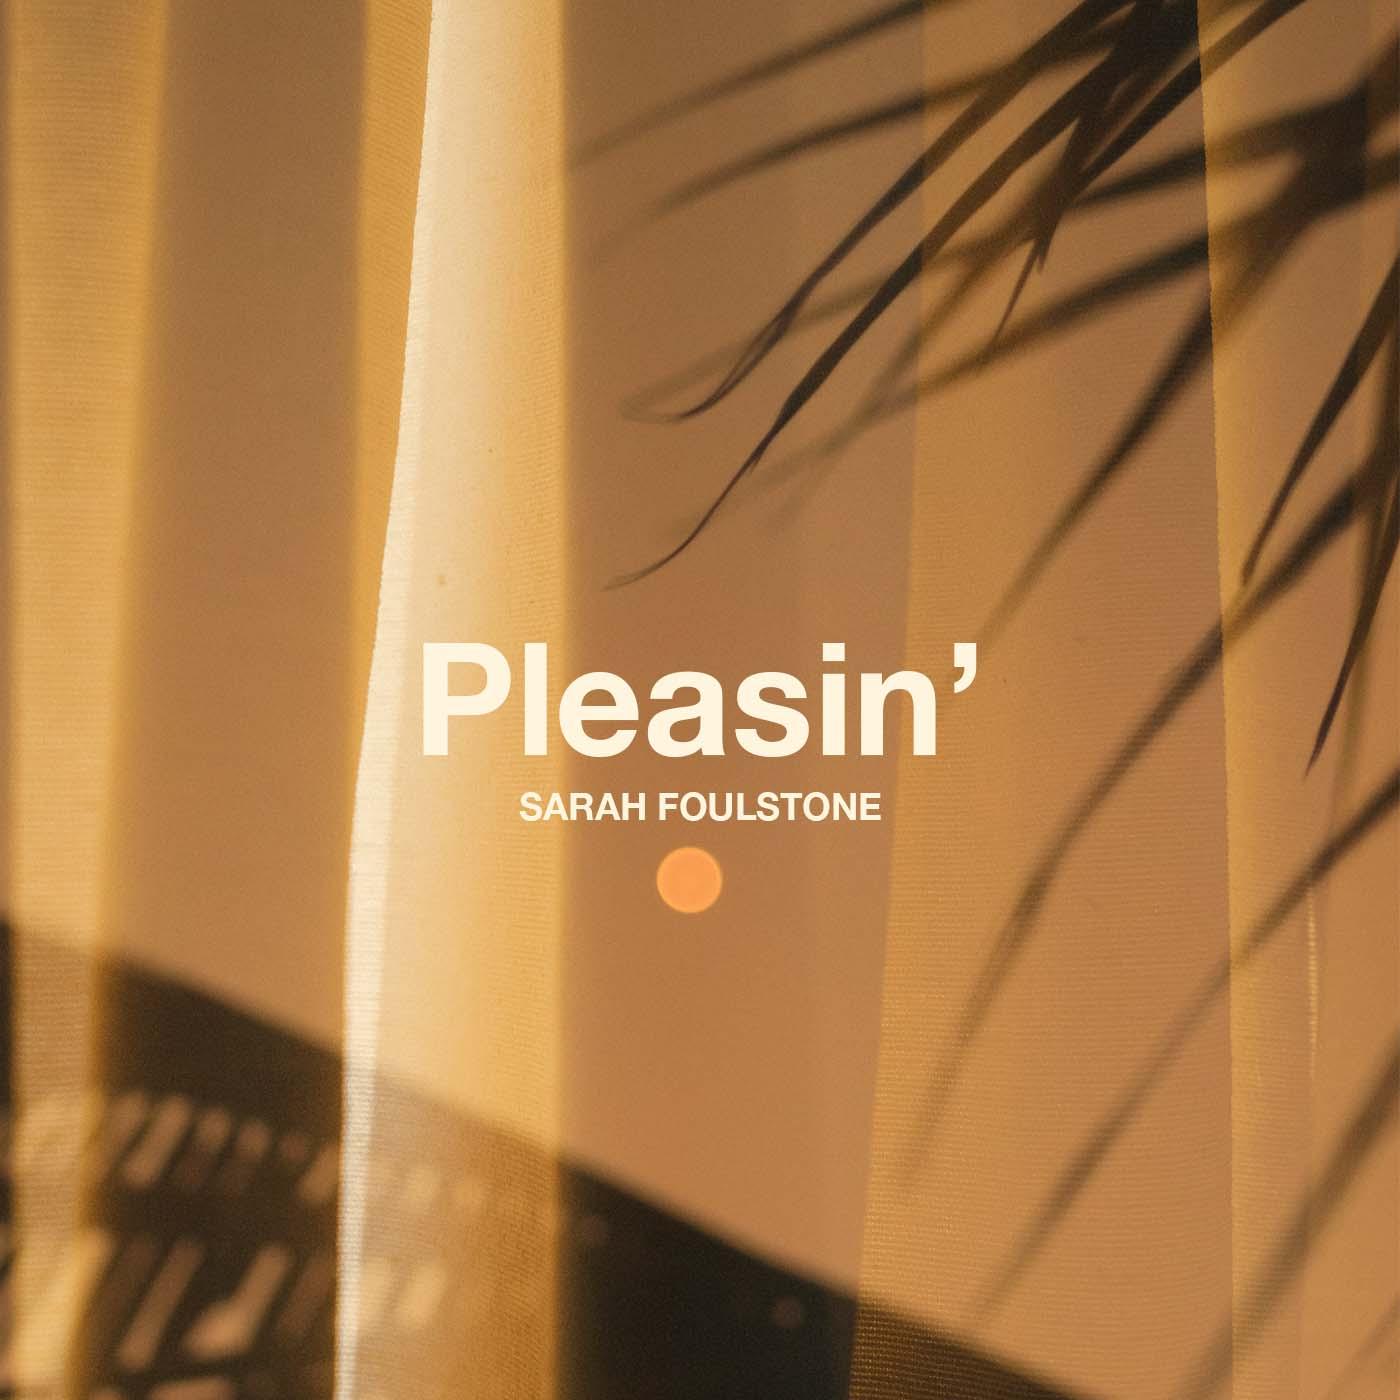 Pleasin' - Sarah Foulstone